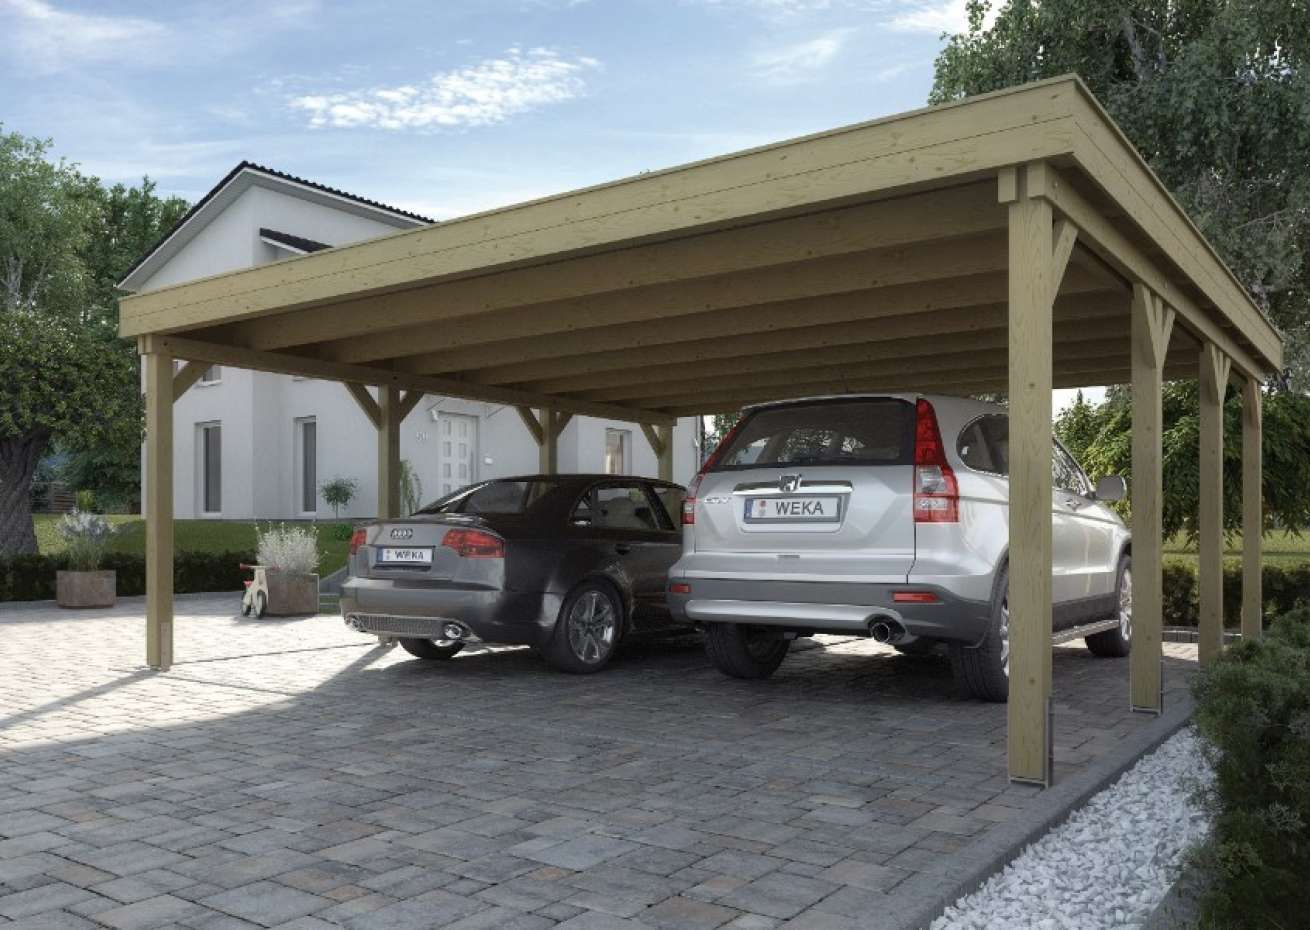 Weka Carport Garden Storage & Housing Konozsigns dedans Weka Carport